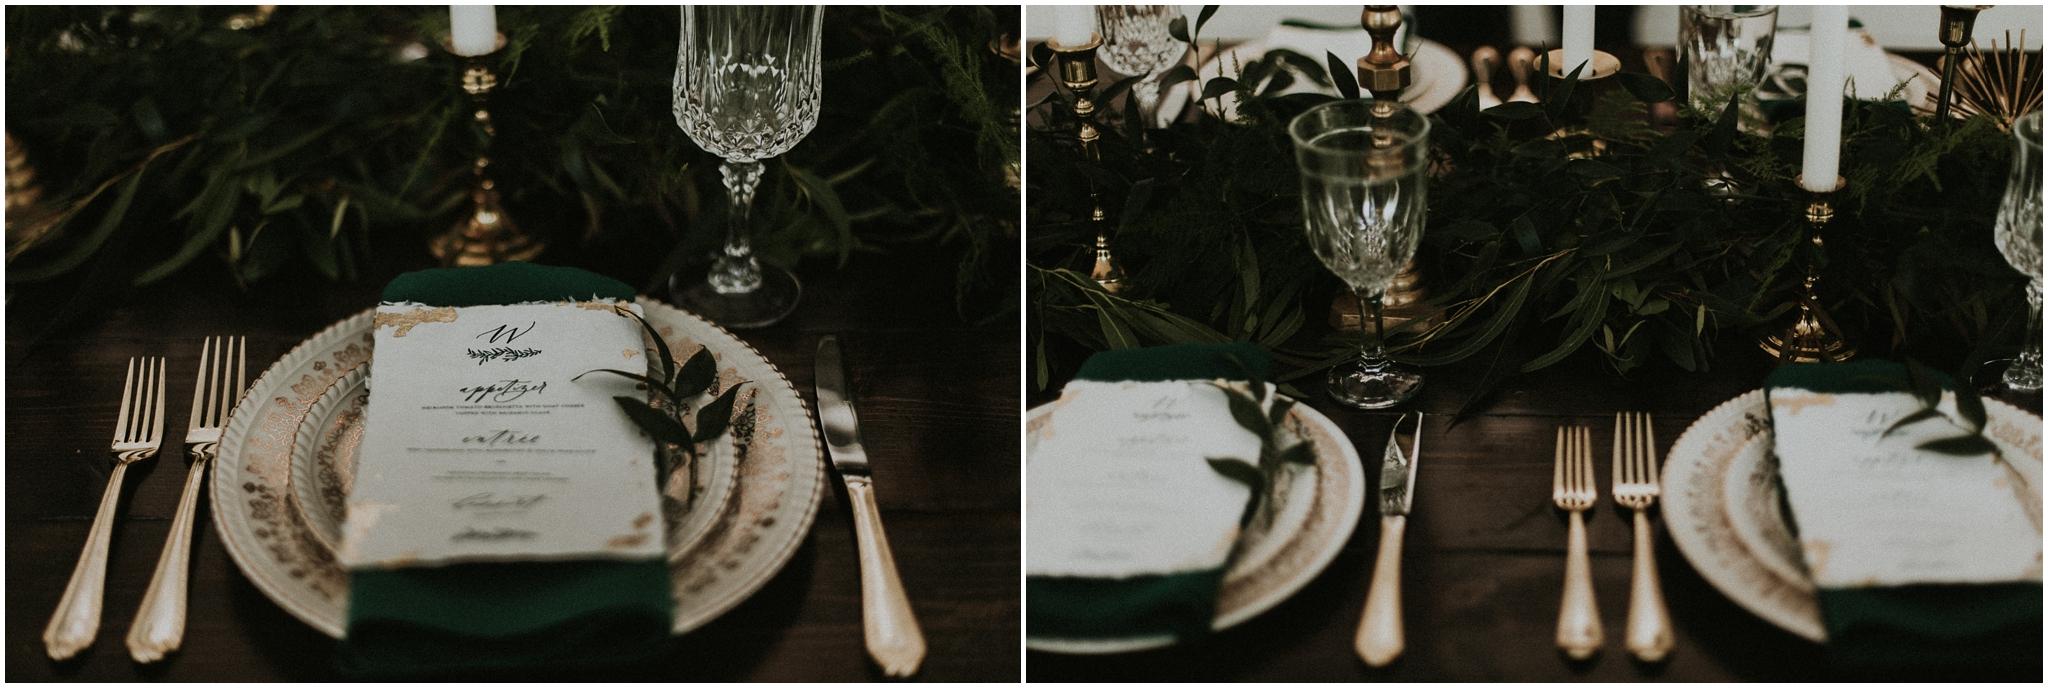 Wedding-photographer-ritchie-hill_0015.jpg